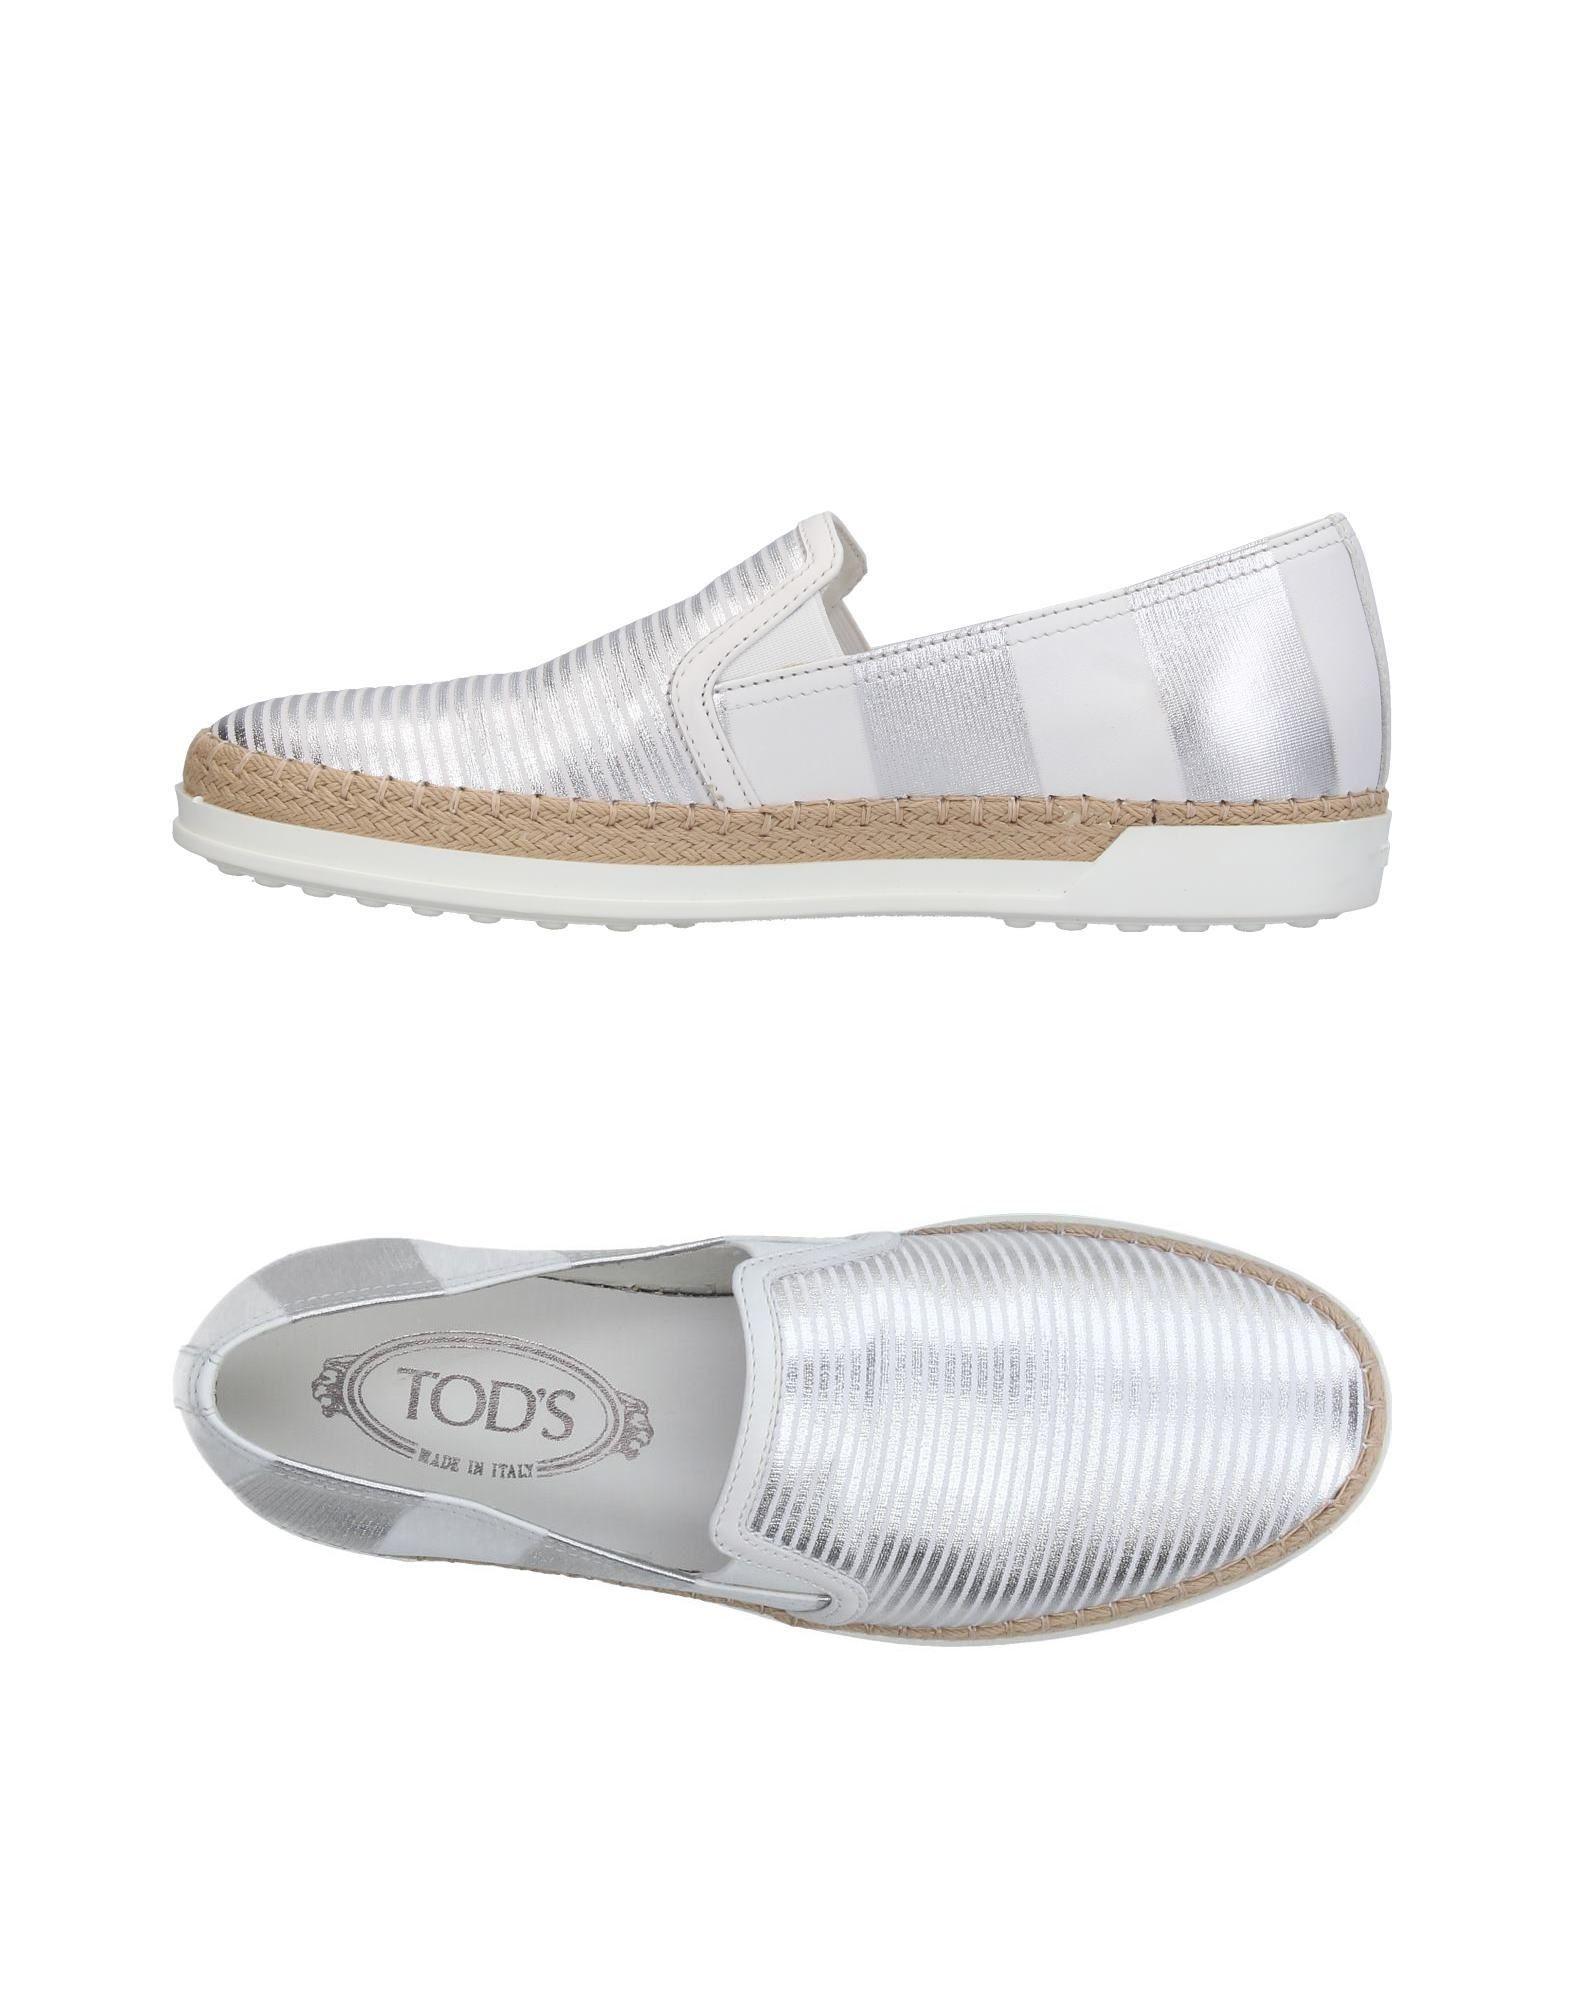 Tod's Sneakers Damen  11366724ABGut aussehende strapazierfähige Schuhe